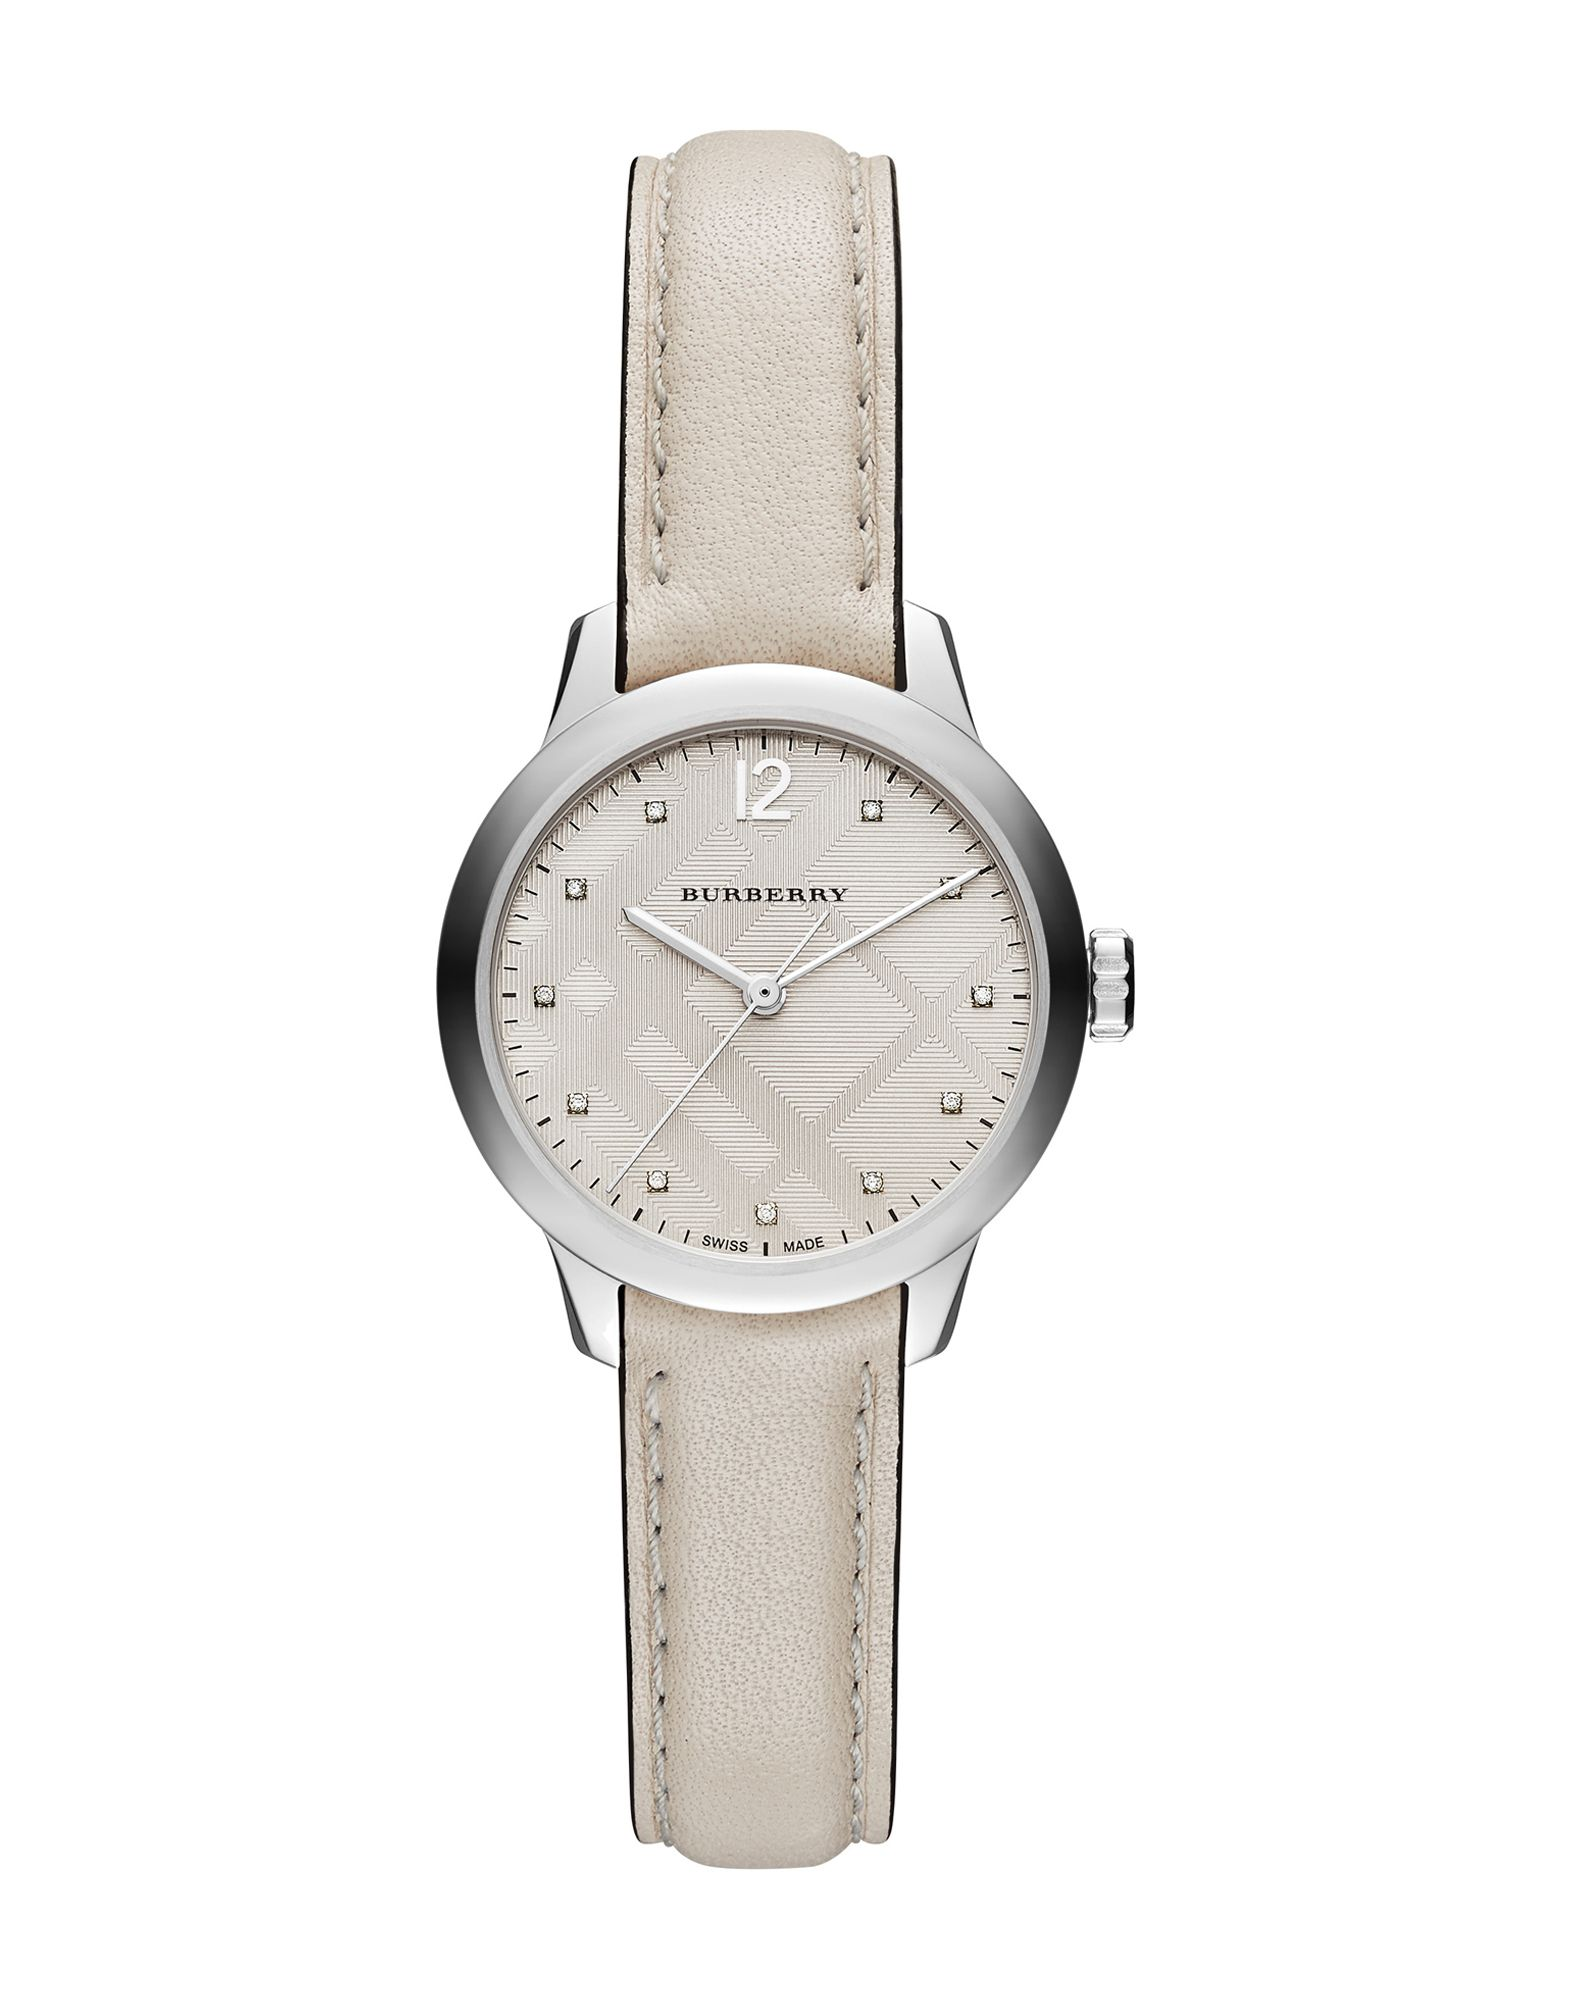 BURBERRY Wrist watches